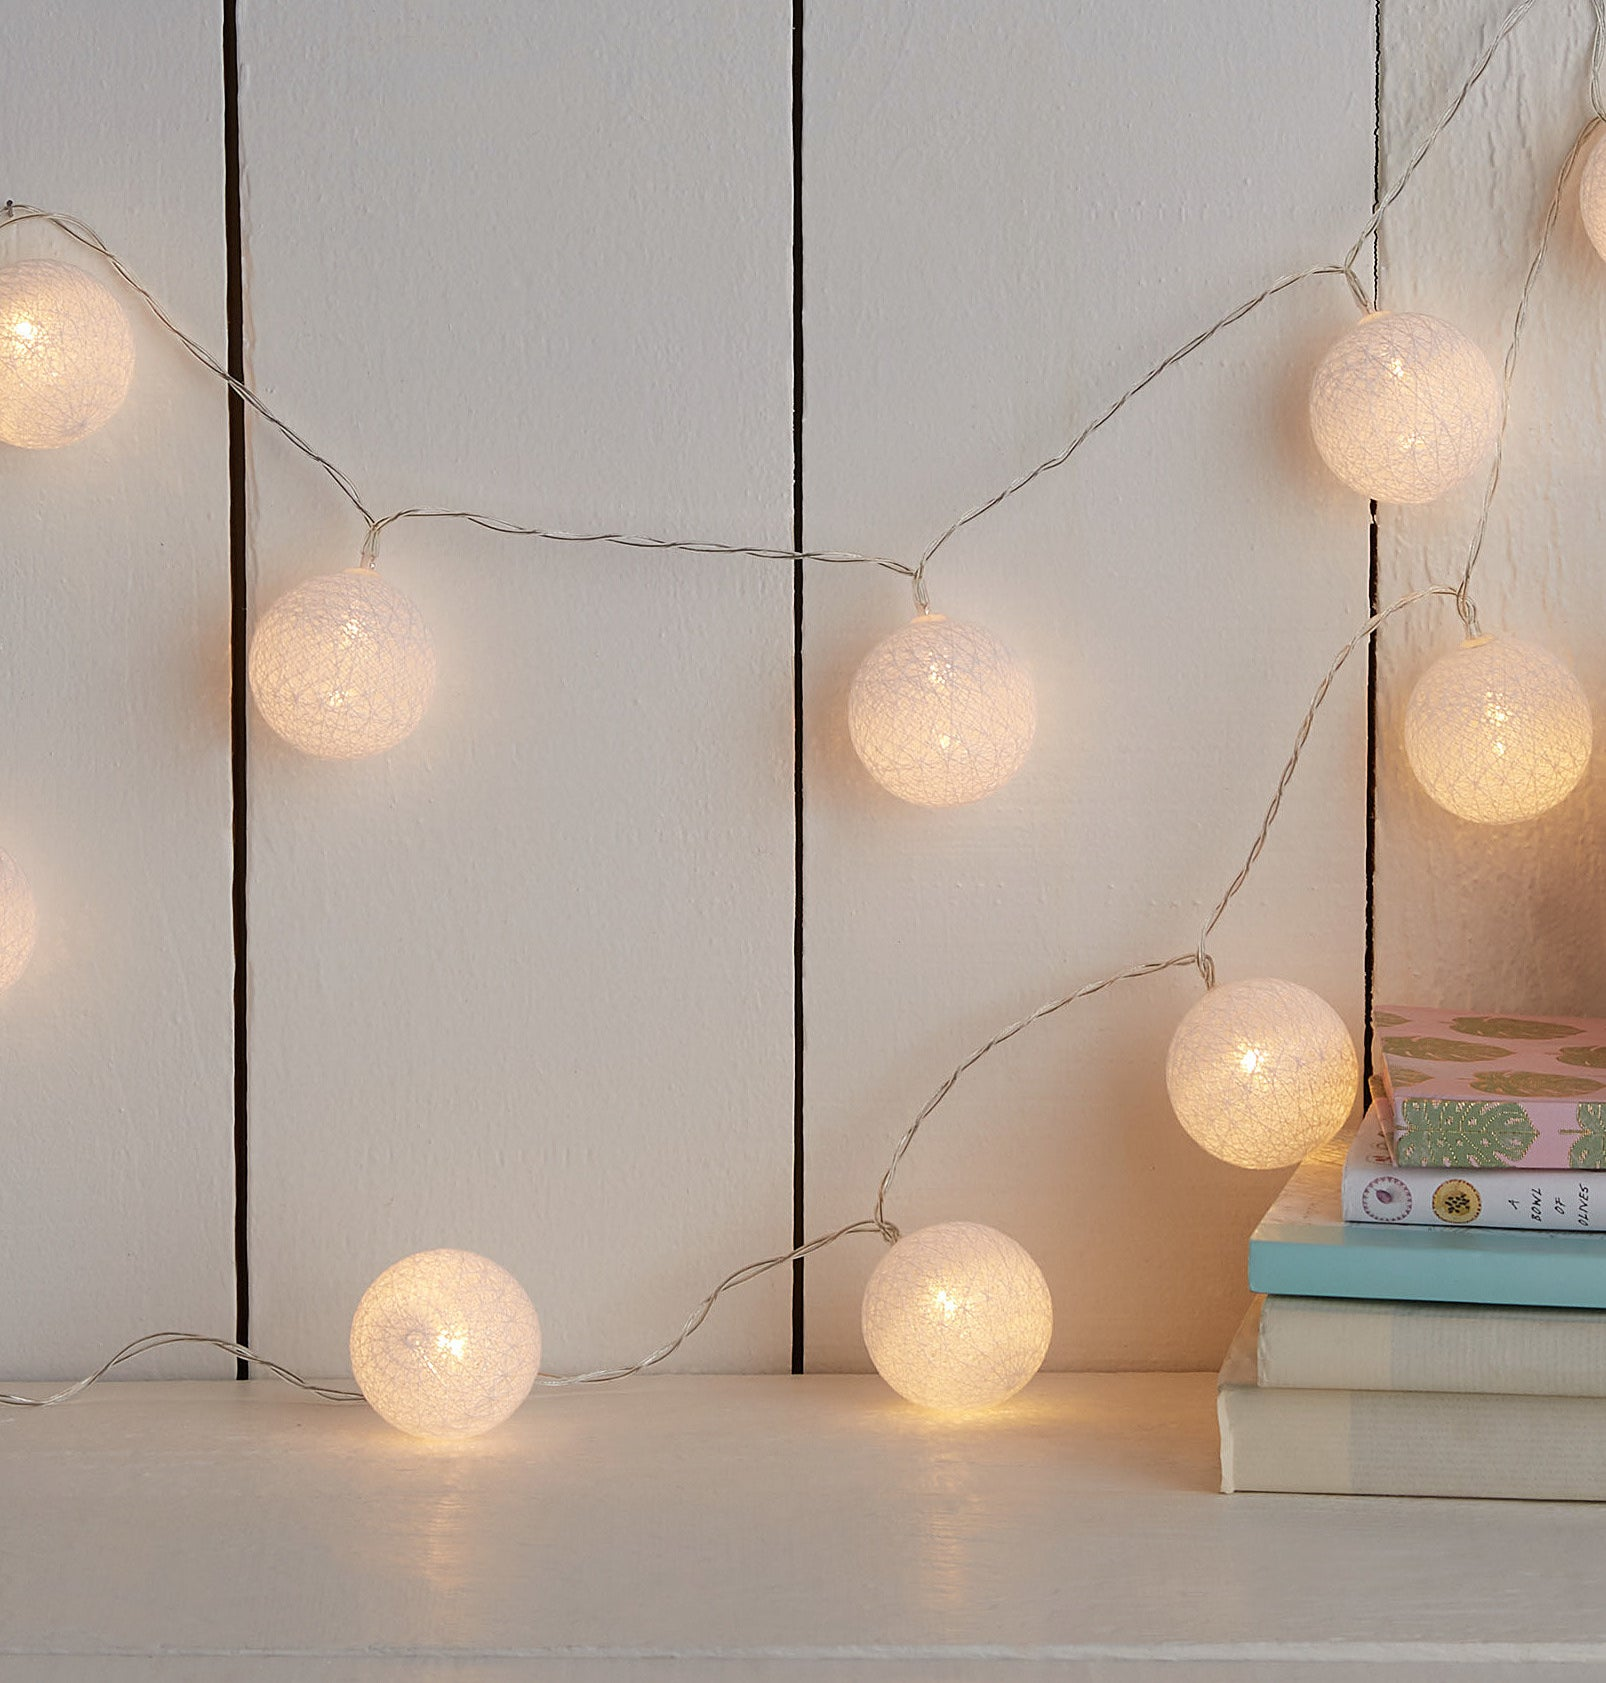 globe lights against a wall